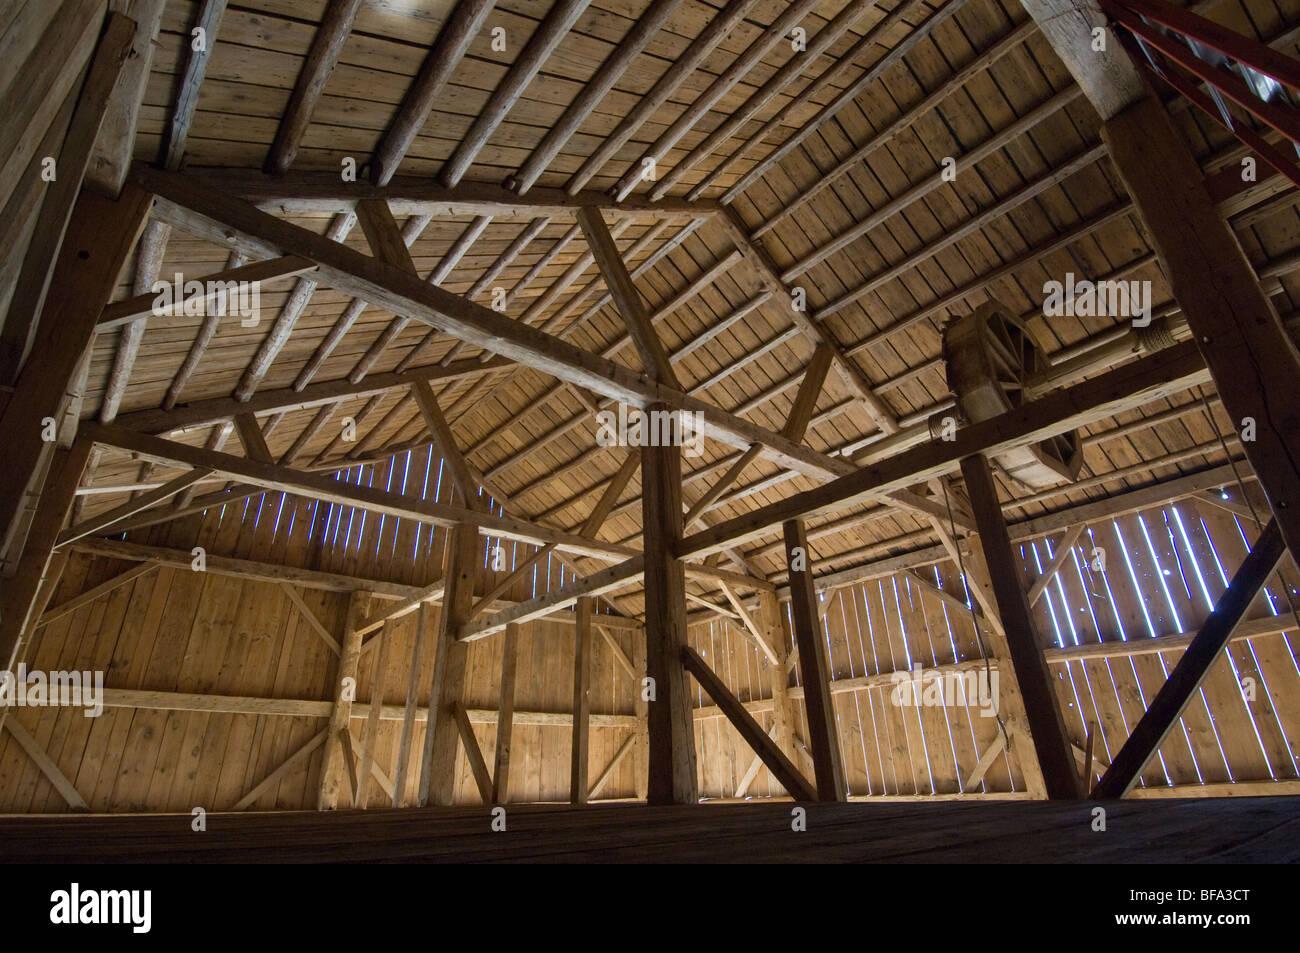 Empty timber frame barn - Stock Image